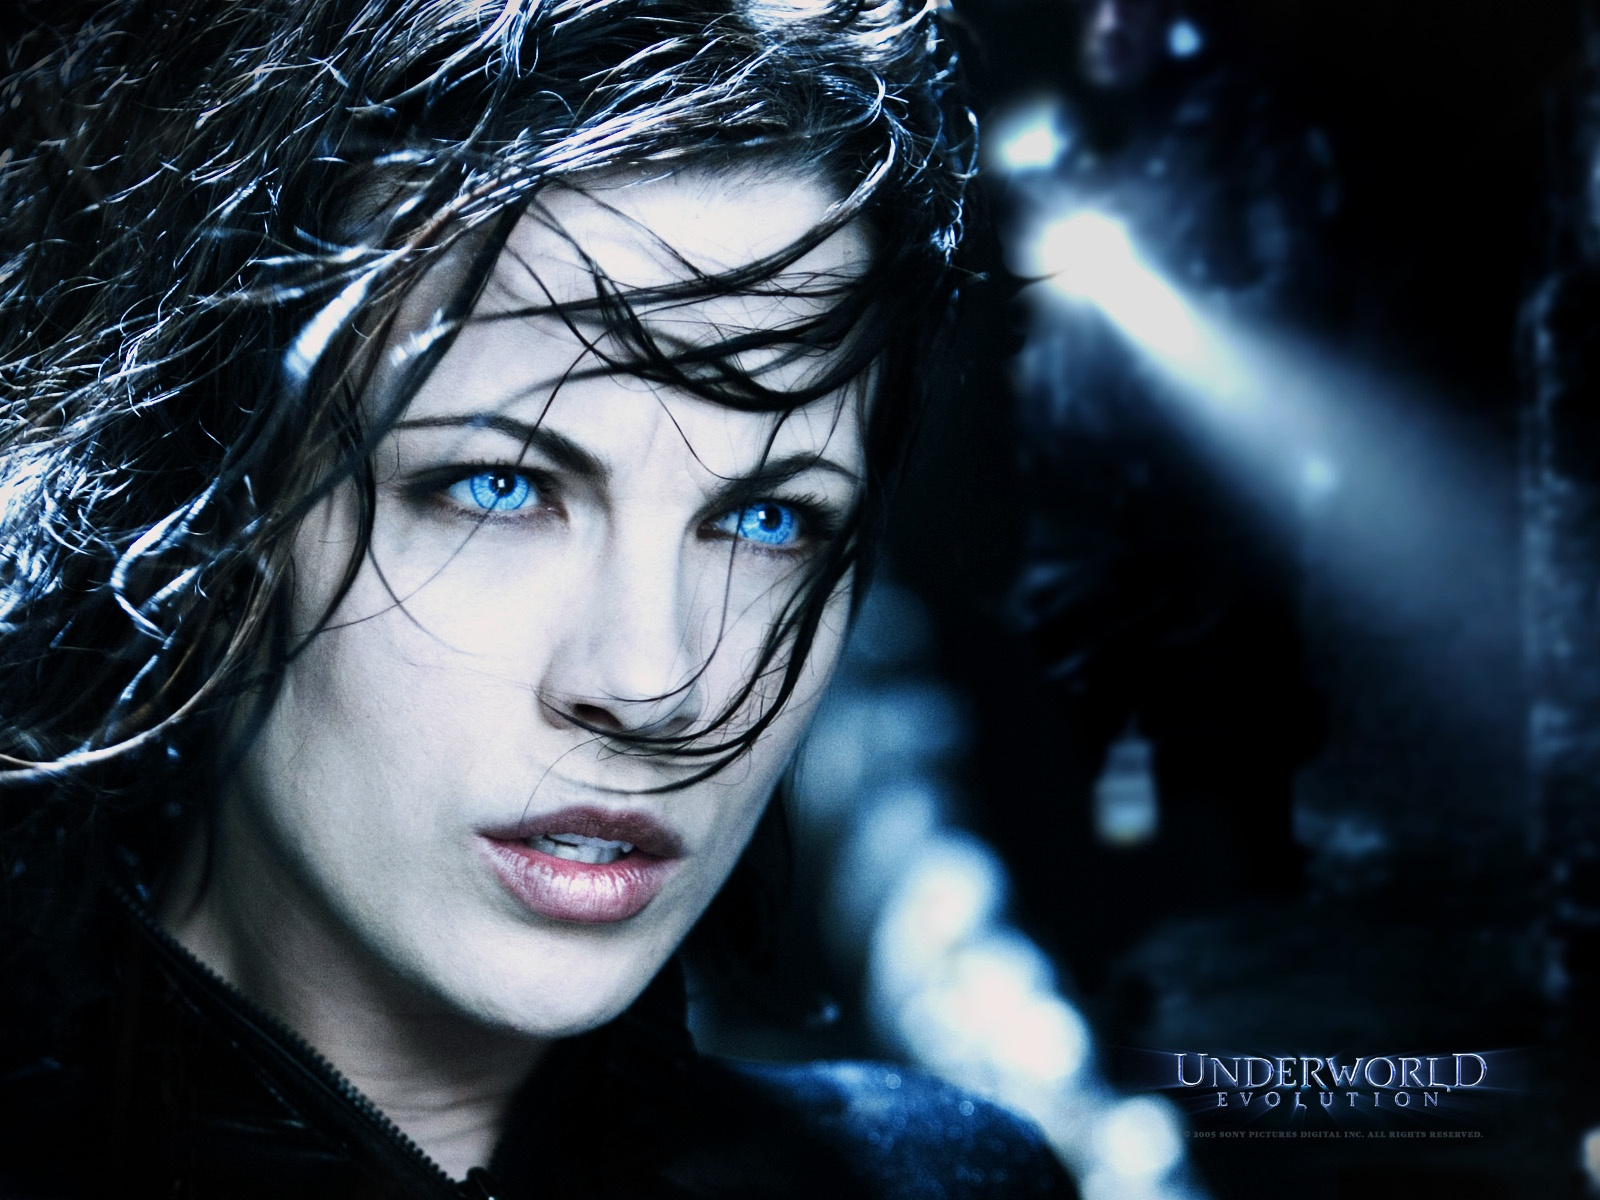 Underworld 4 - visszatér Kate Beckinsale